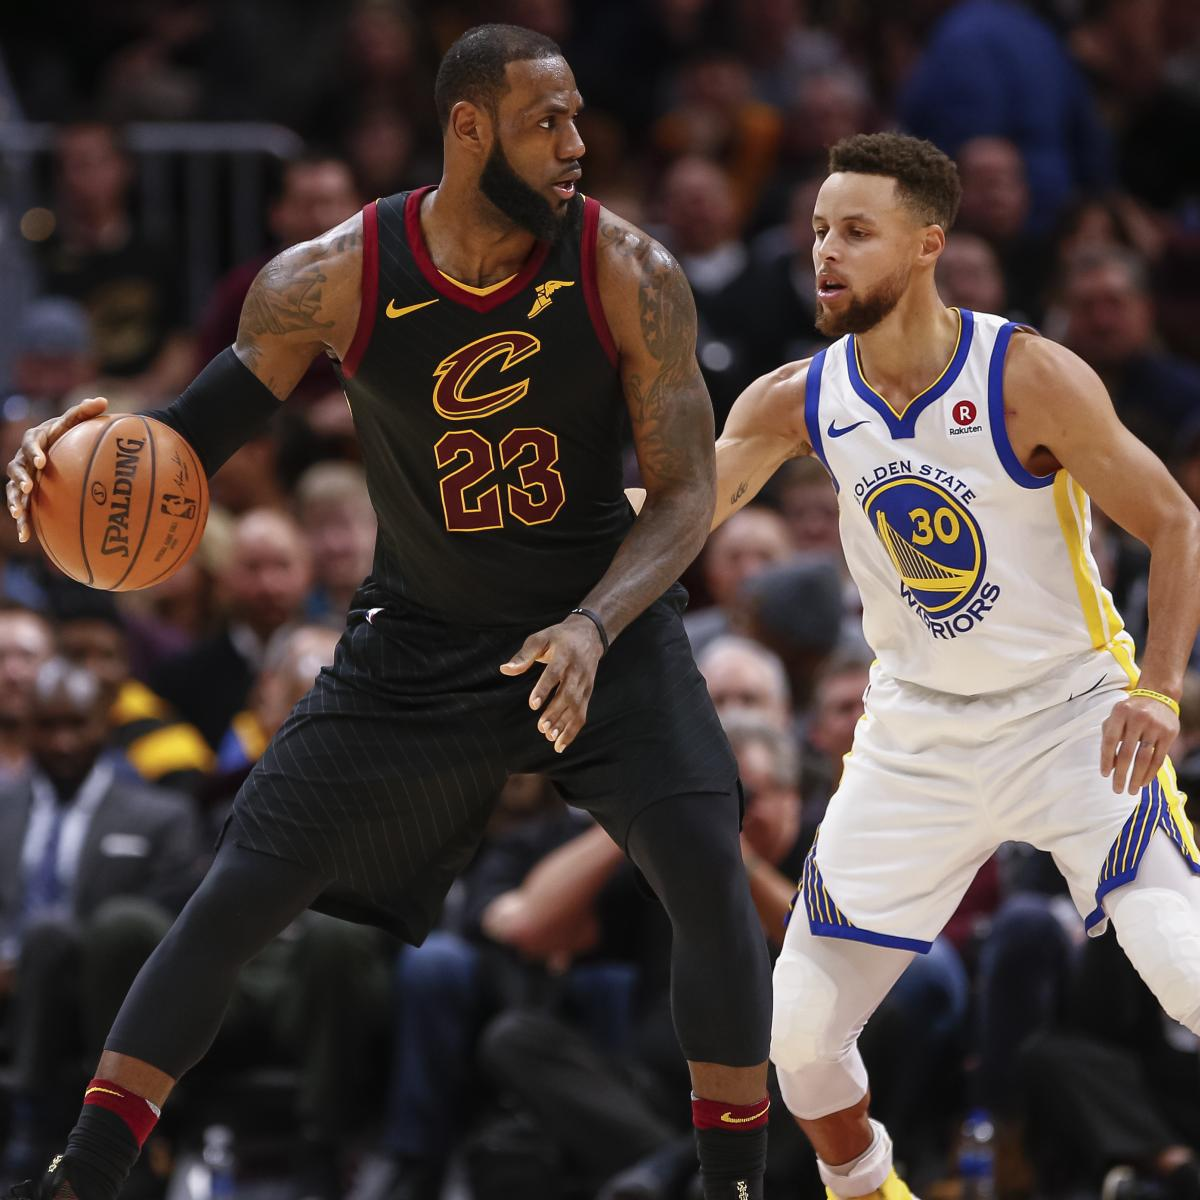 Stephen Curry, LeBron James Headline US Men's Basketball